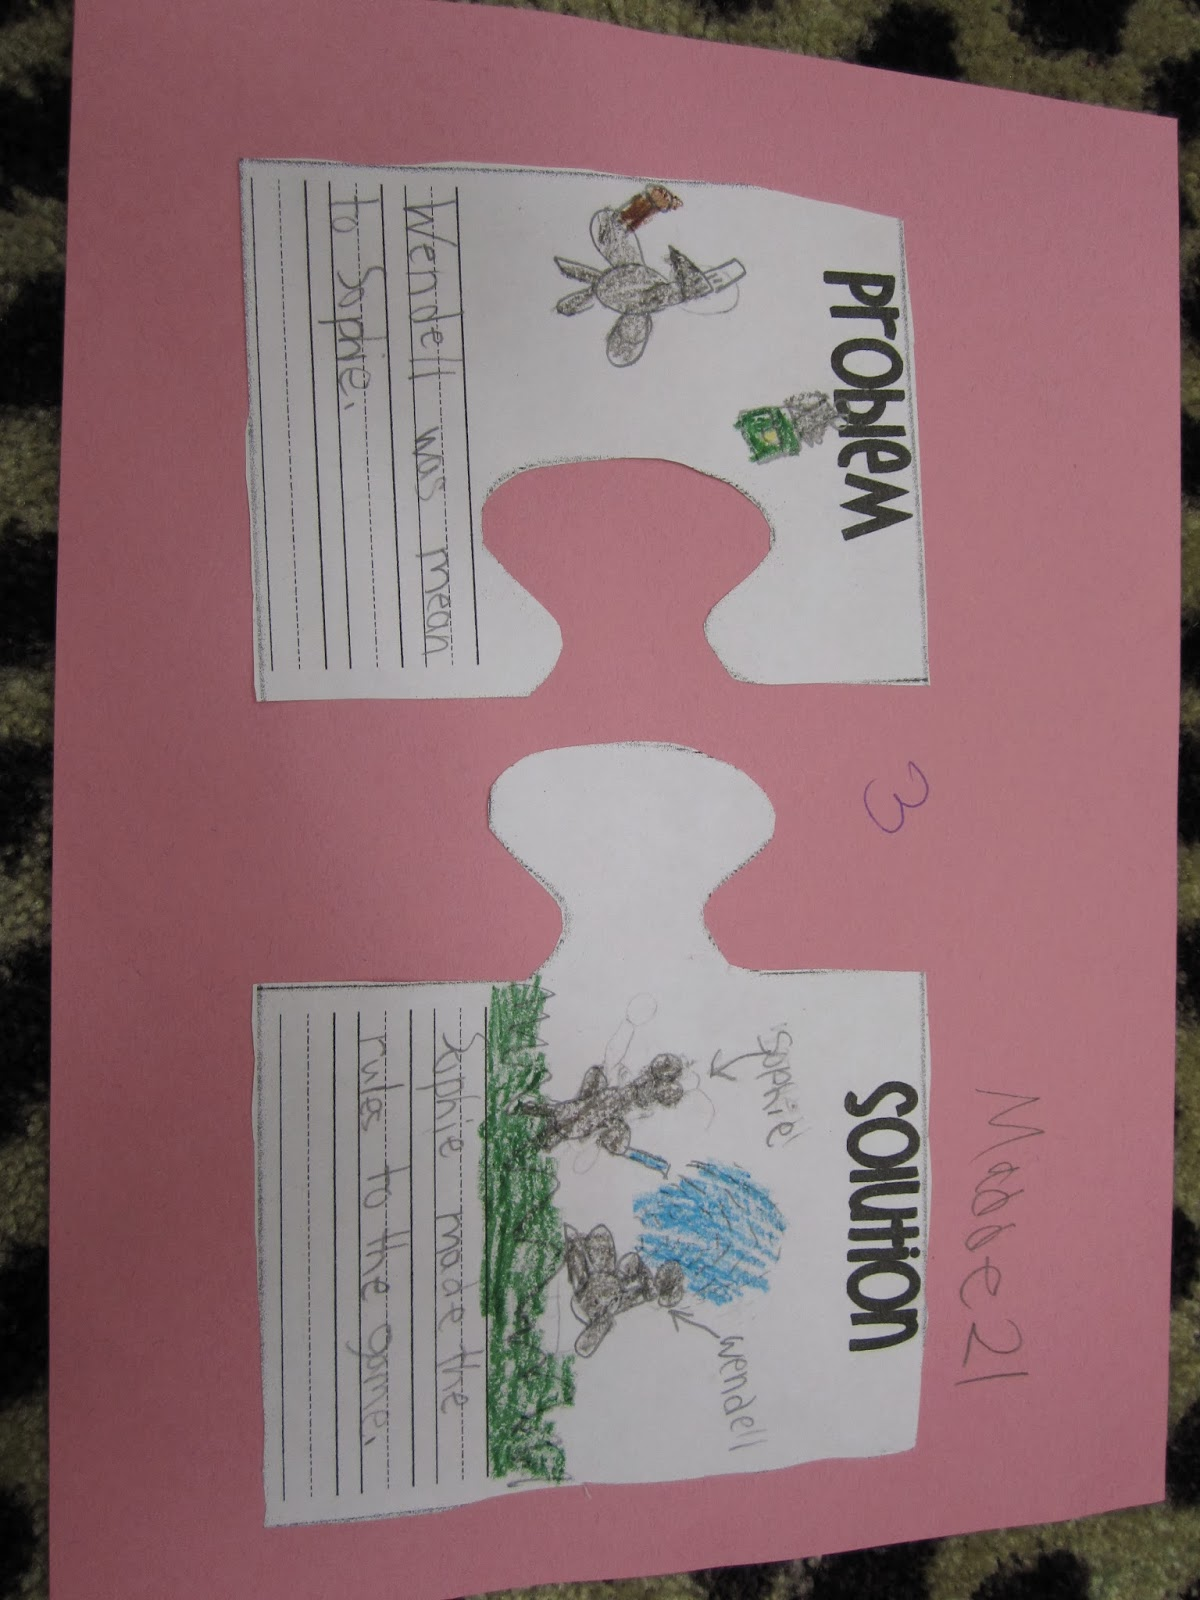 Second Grade Perks Problem And Solution Adding Details